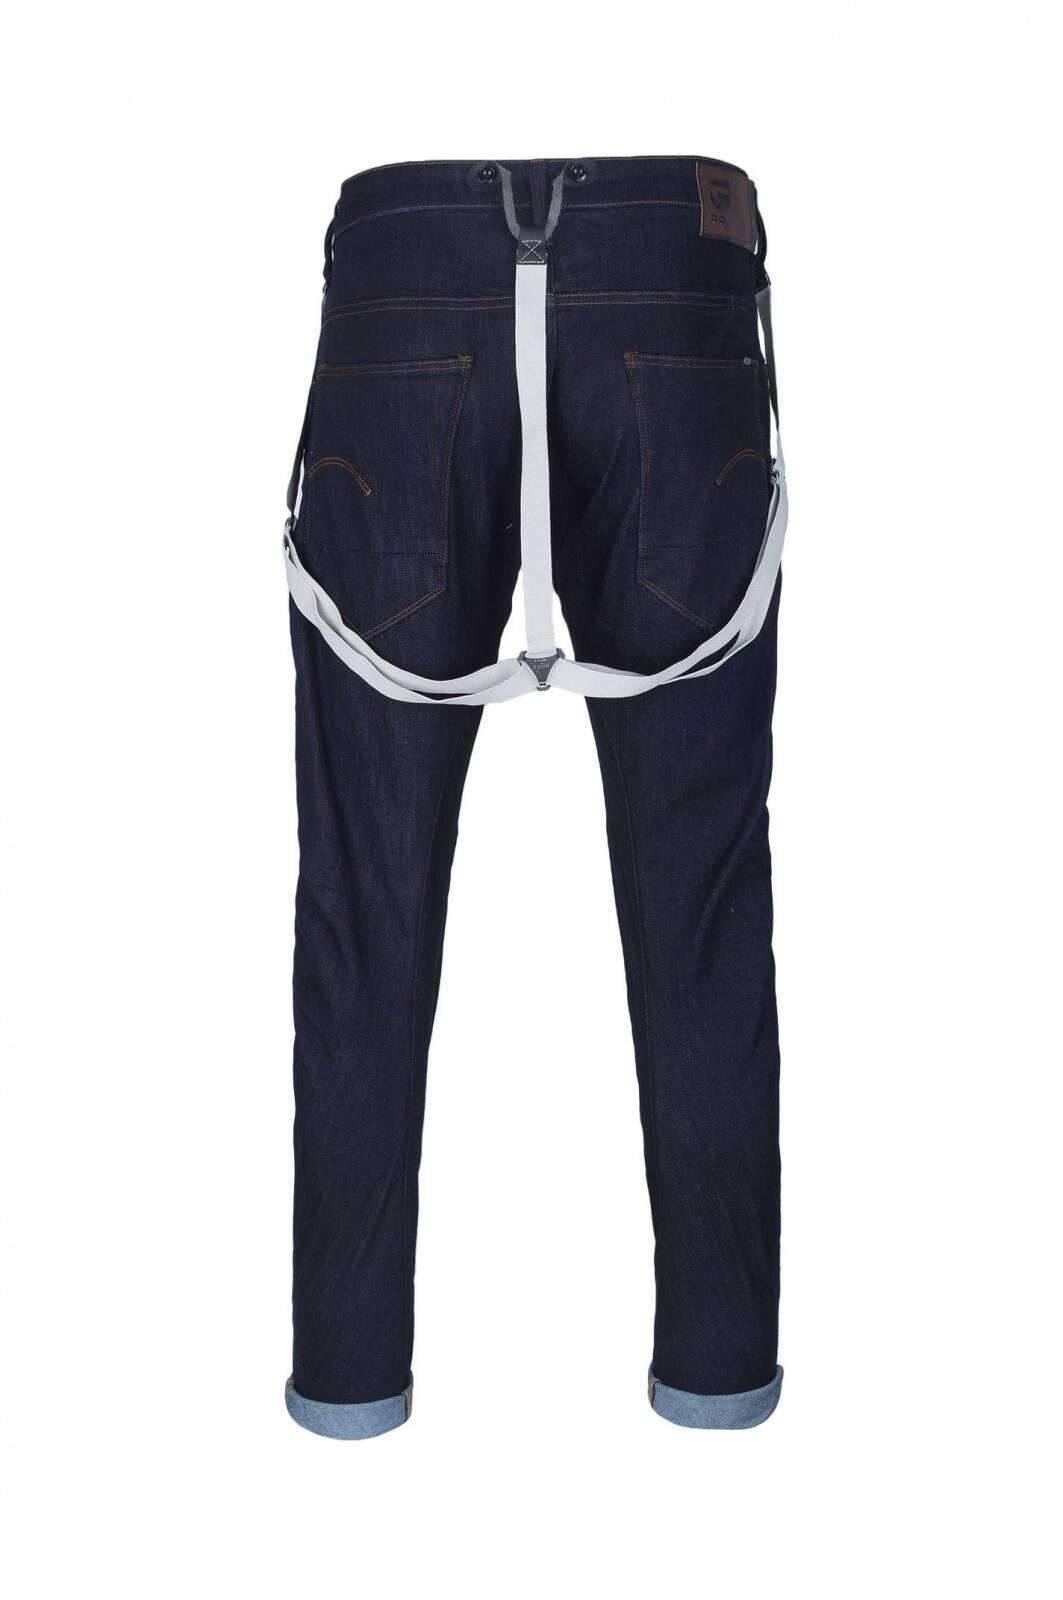 arc 3d slim braces jeans g star raw navy blue jeans. Black Bedroom Furniture Sets. Home Design Ideas